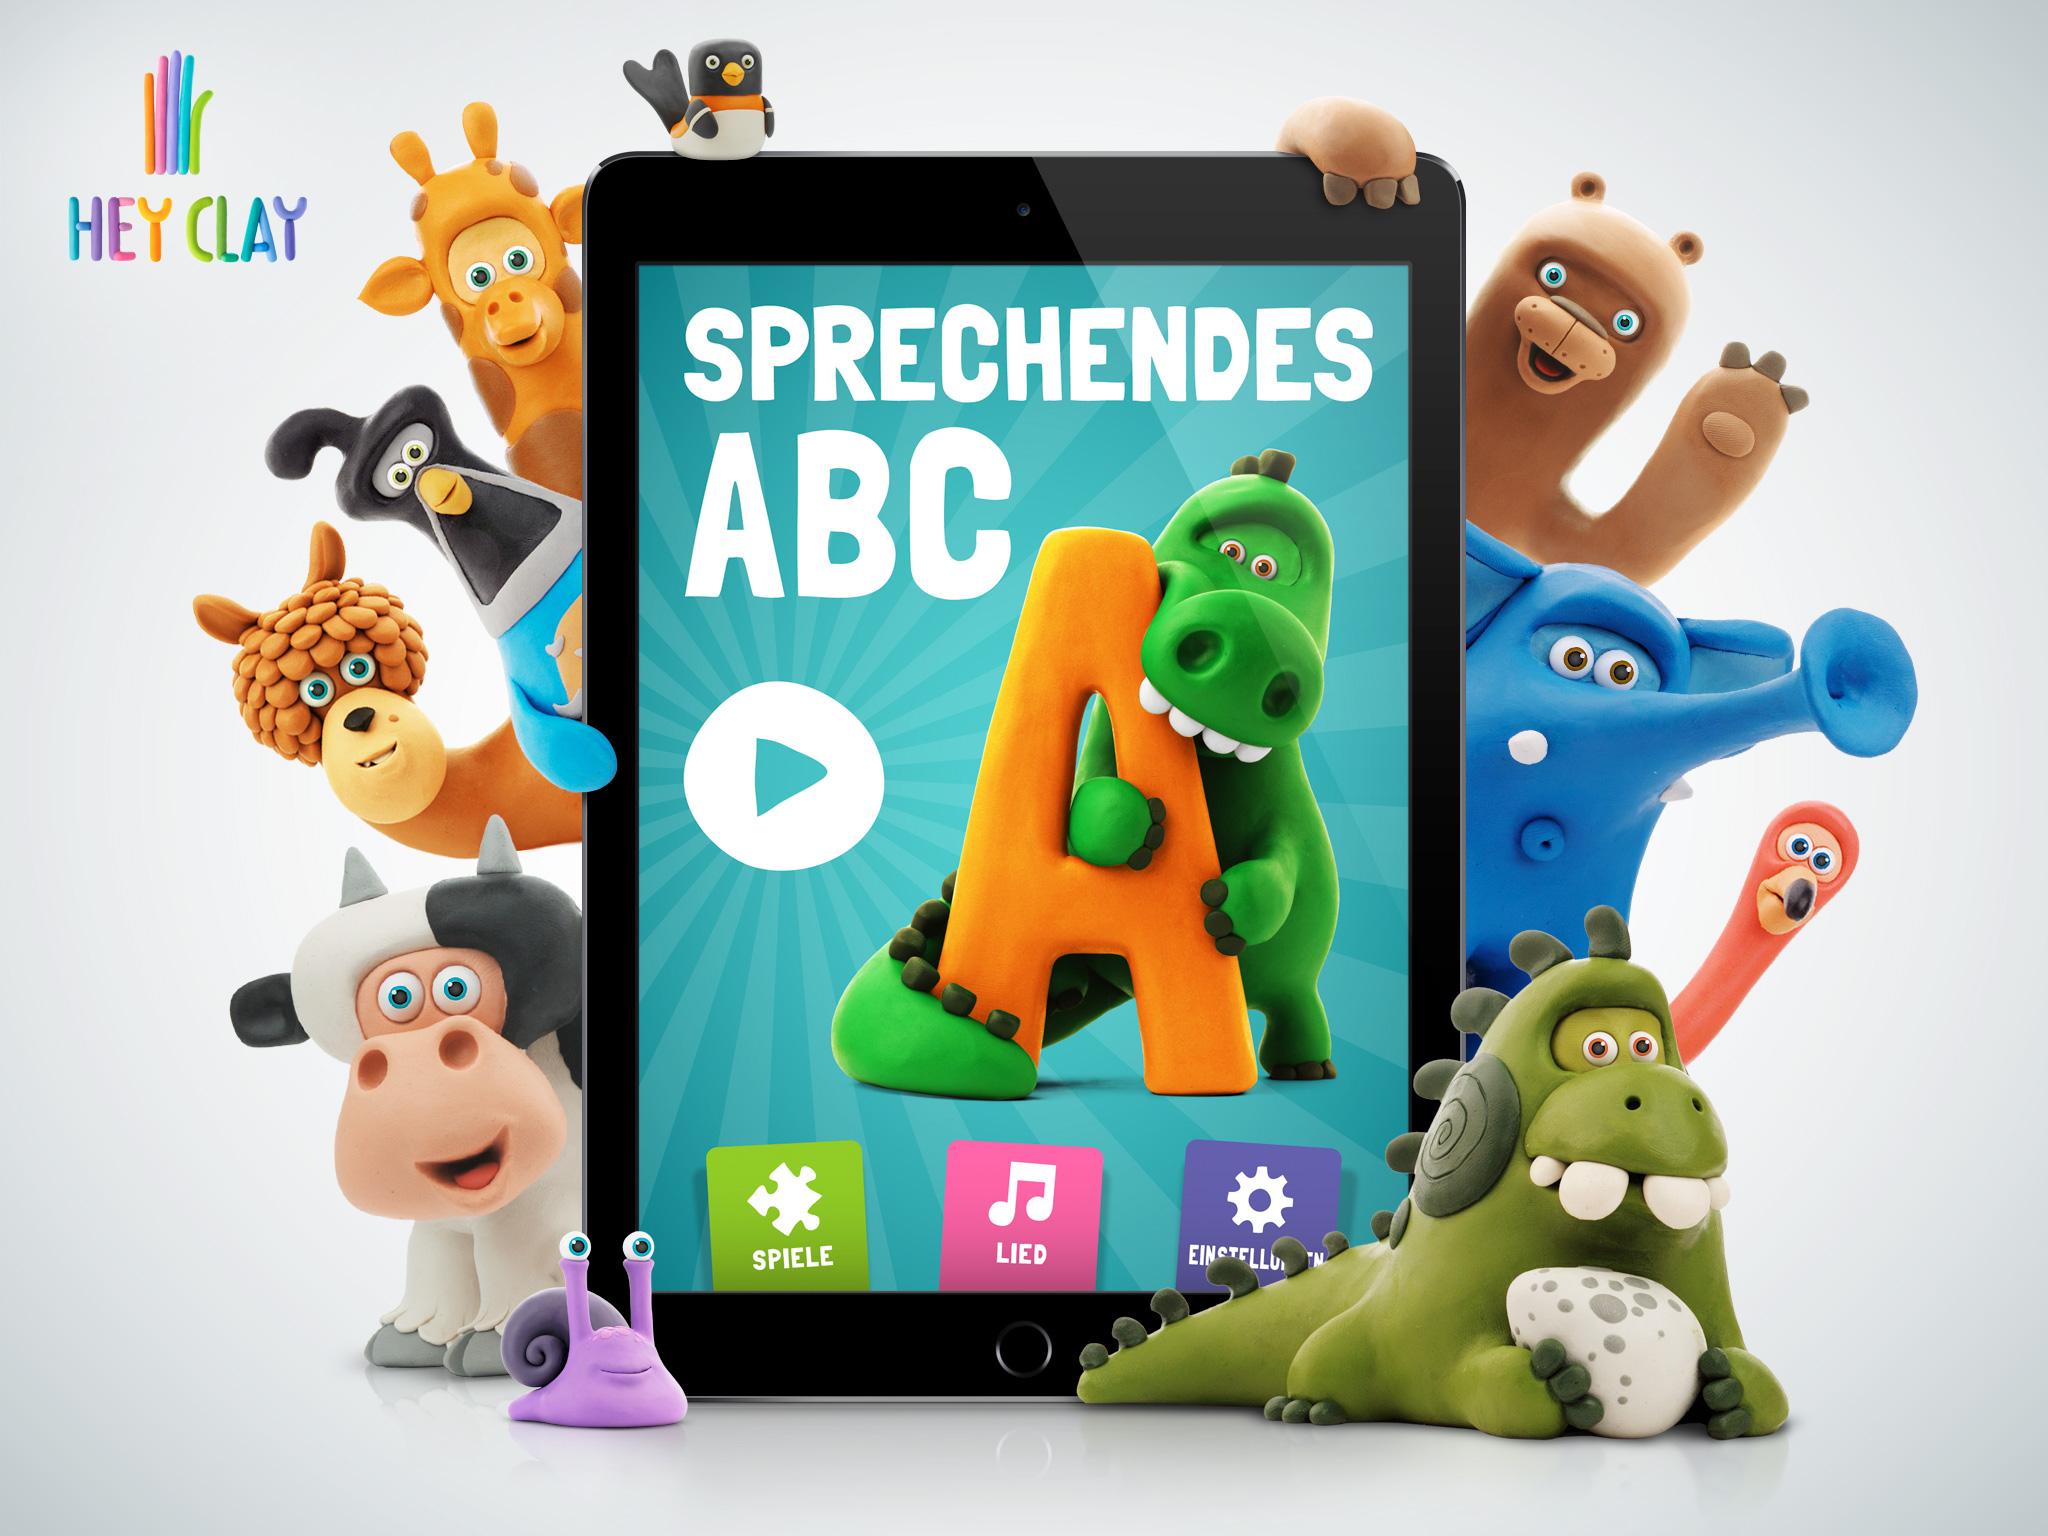 Sprechendes ABC